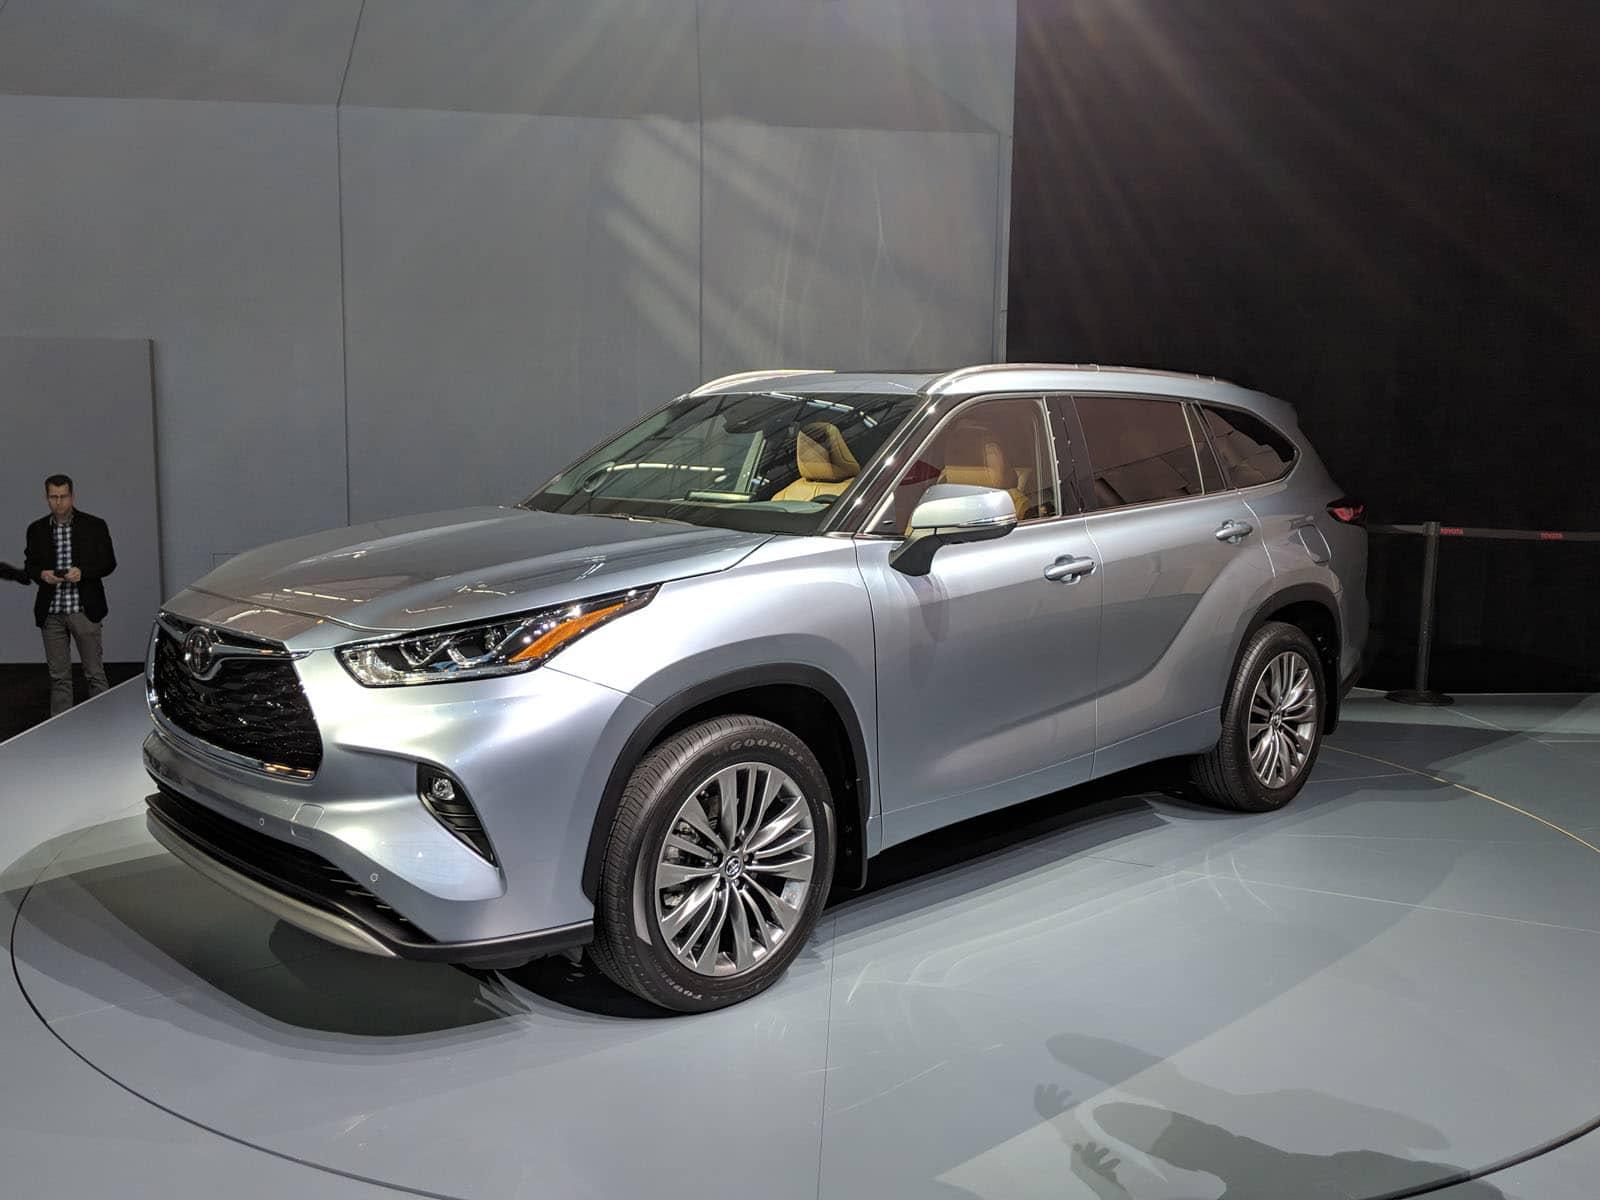 2020 Toyota Highlander 2020 Subaru Outback 2020 Mercedes